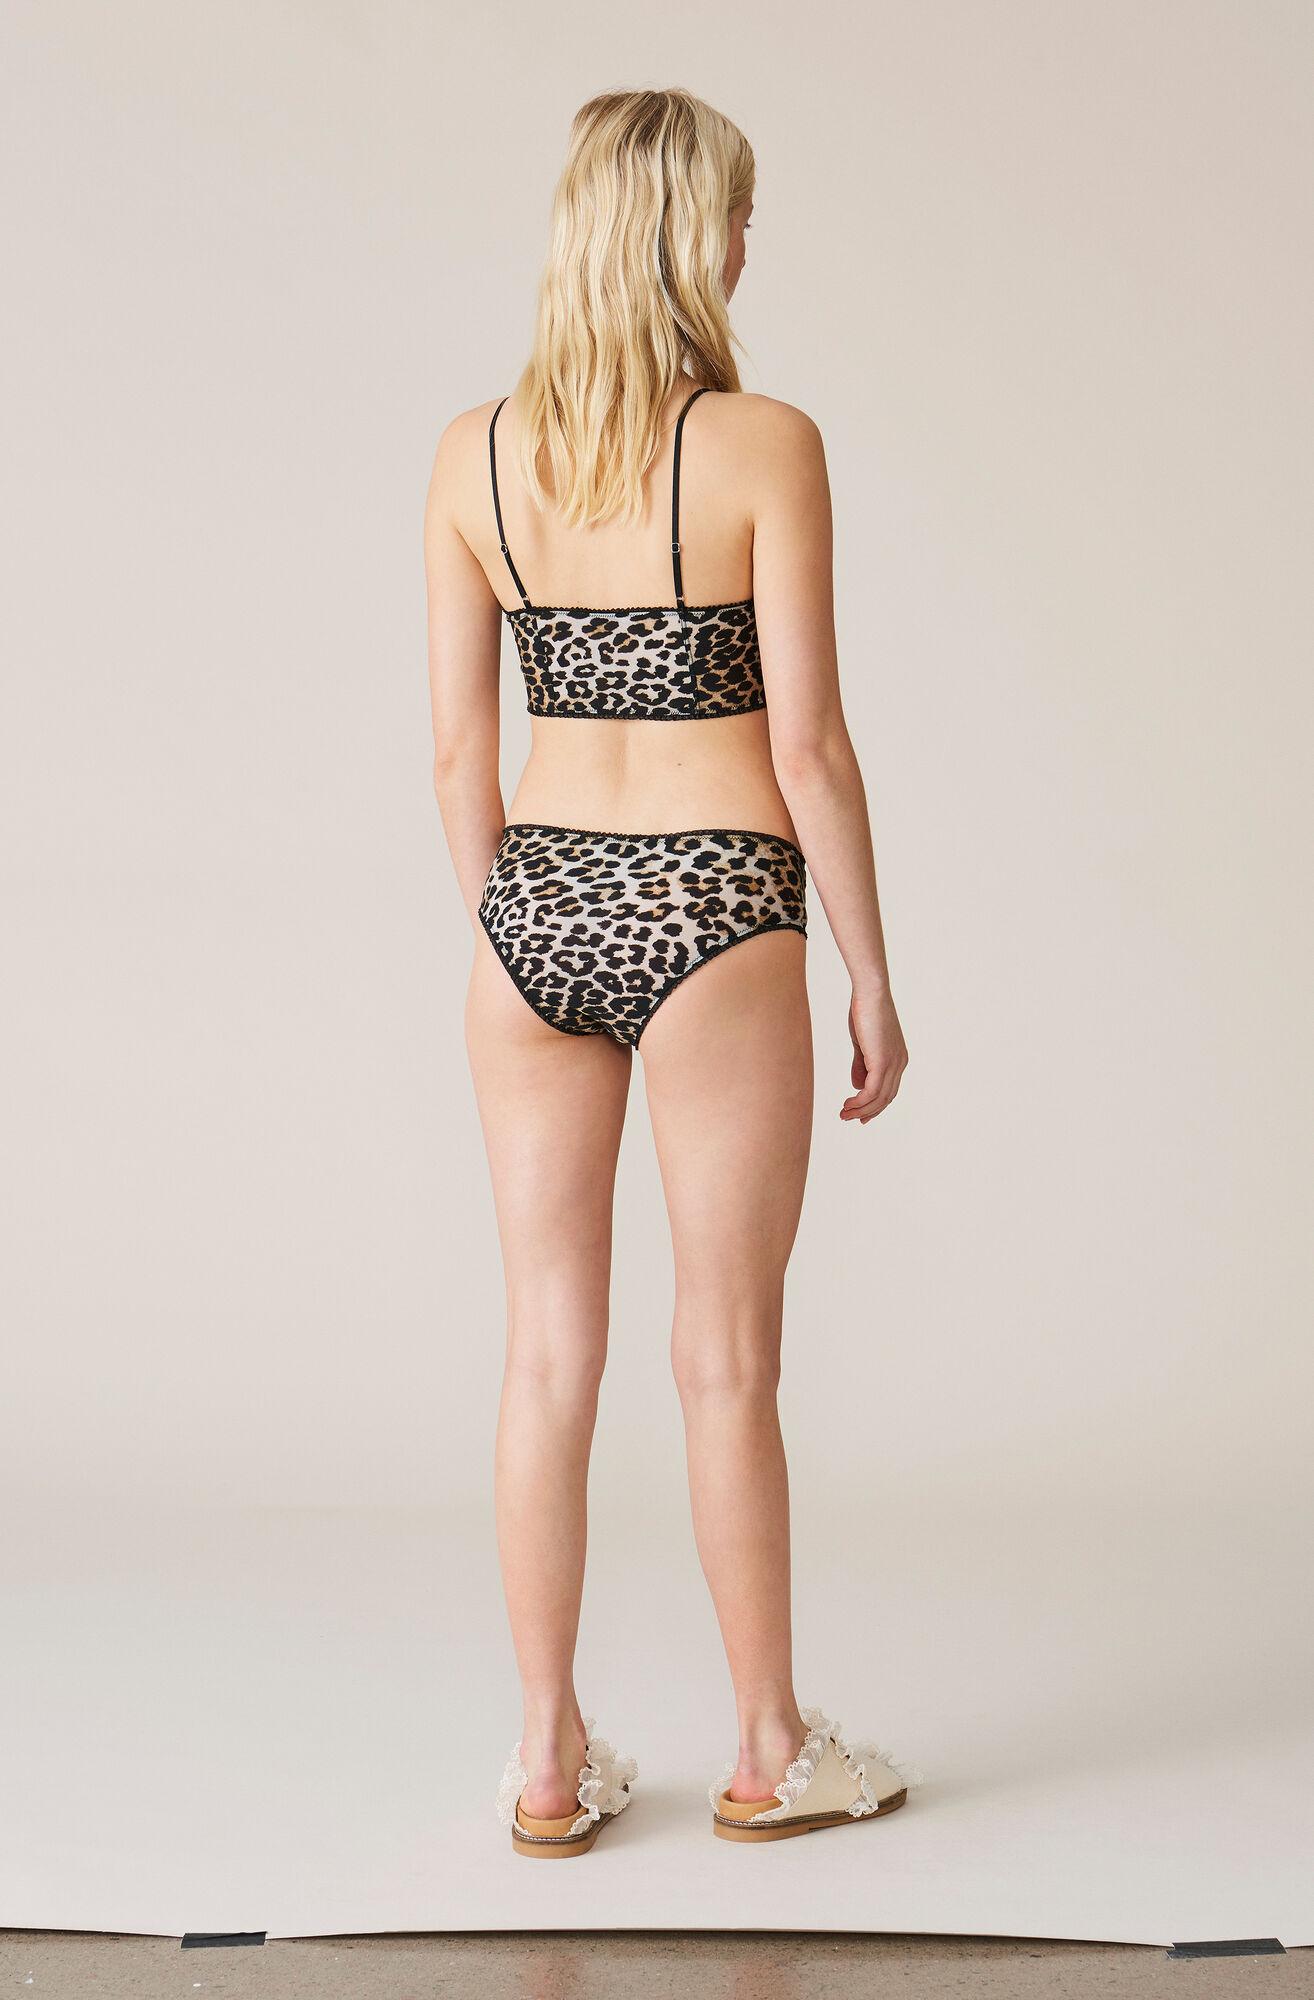 Vandalay Panties, Leopard, hi-res